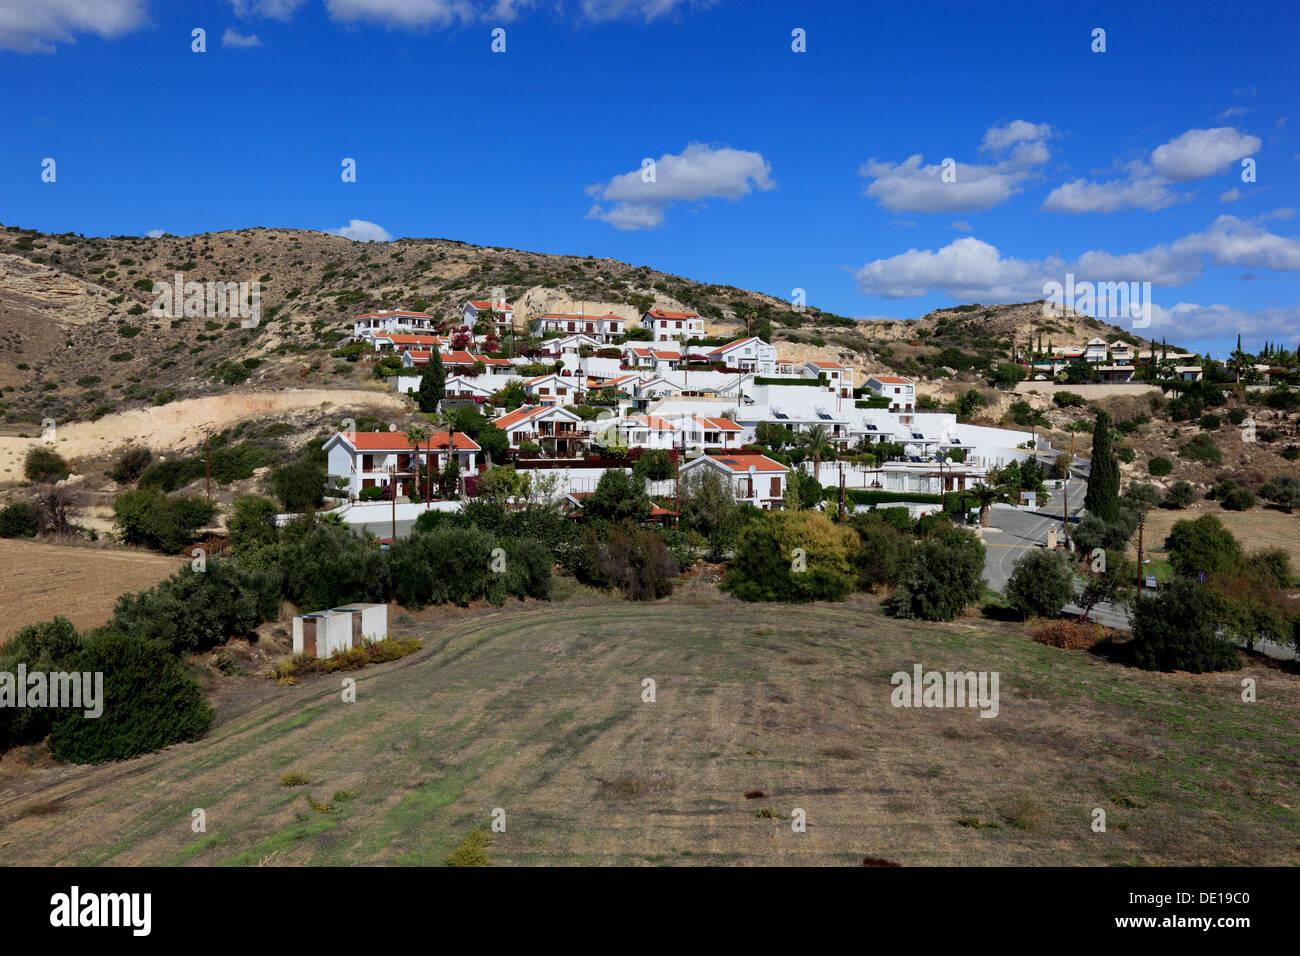 Cyprus, Pissouri, new estate, apartments - Stock Image